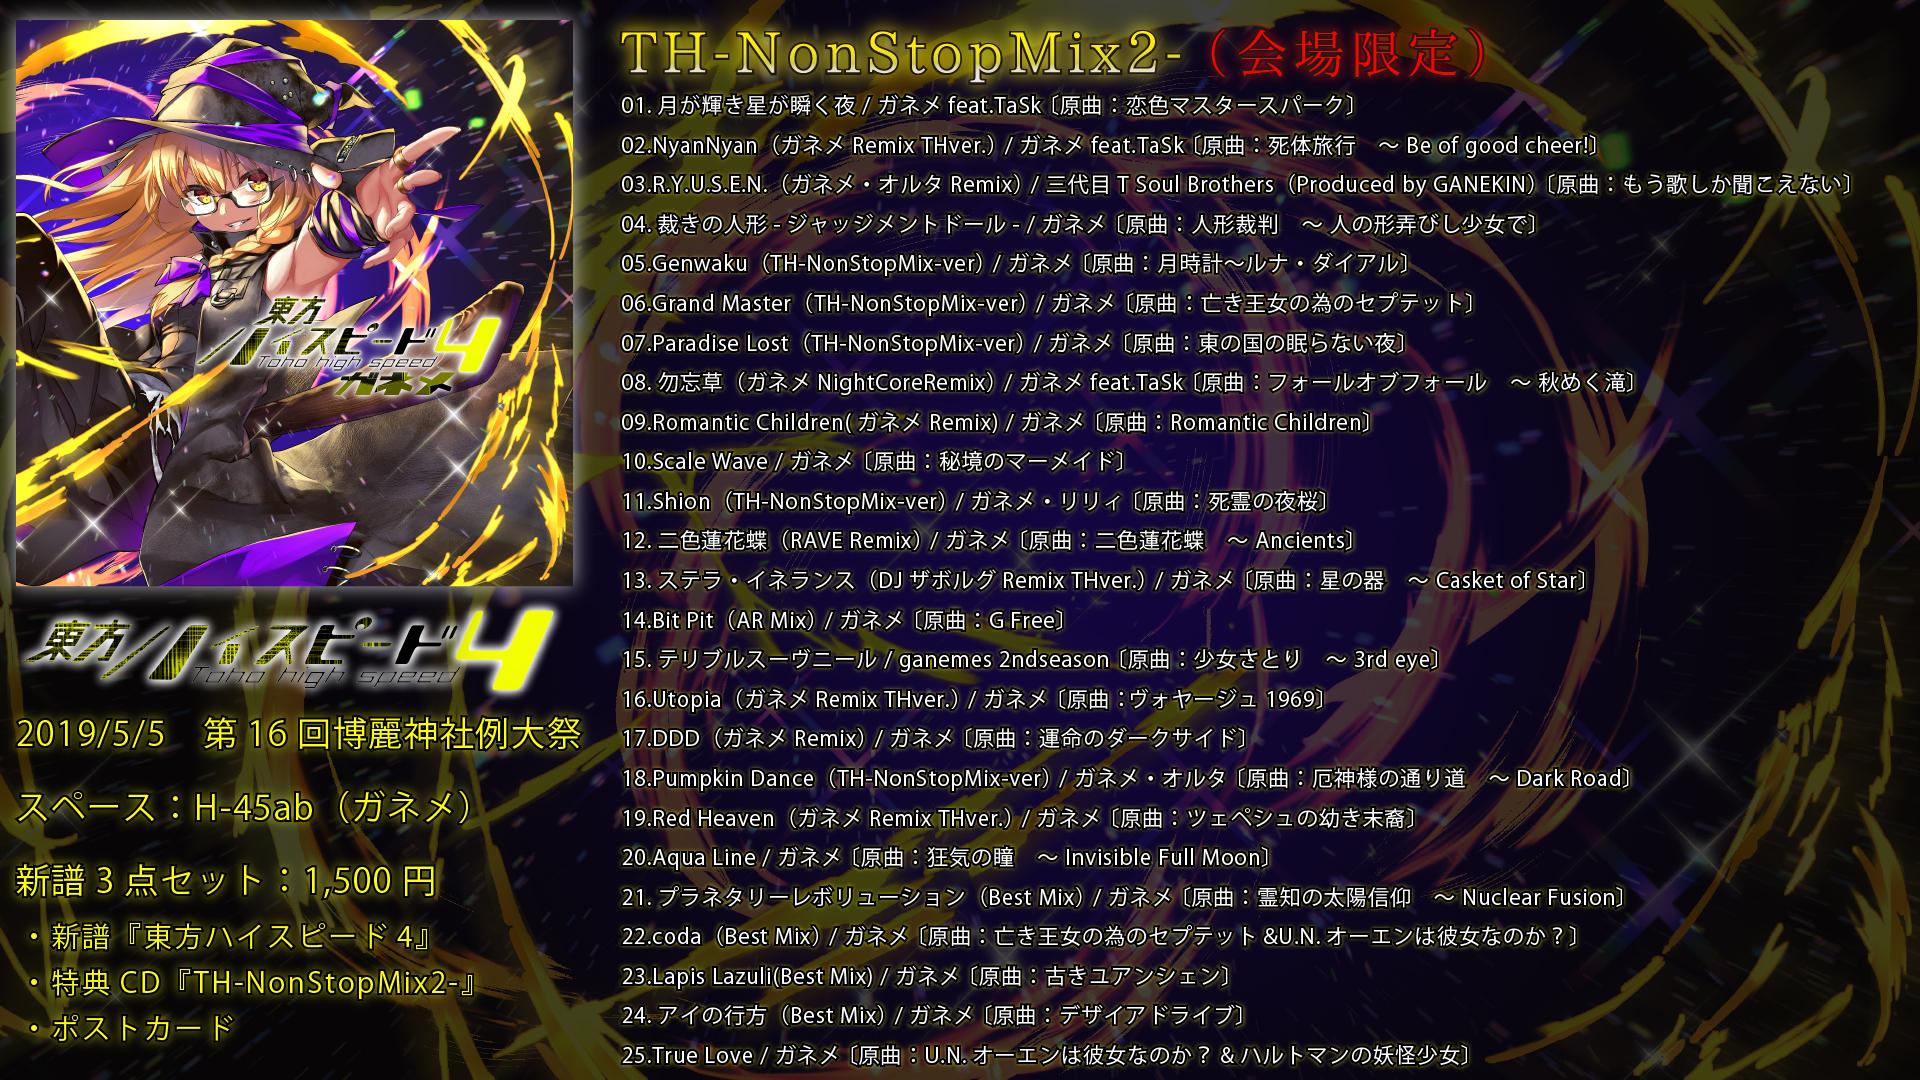 TH-NonStopMix2-トラックリスト_2